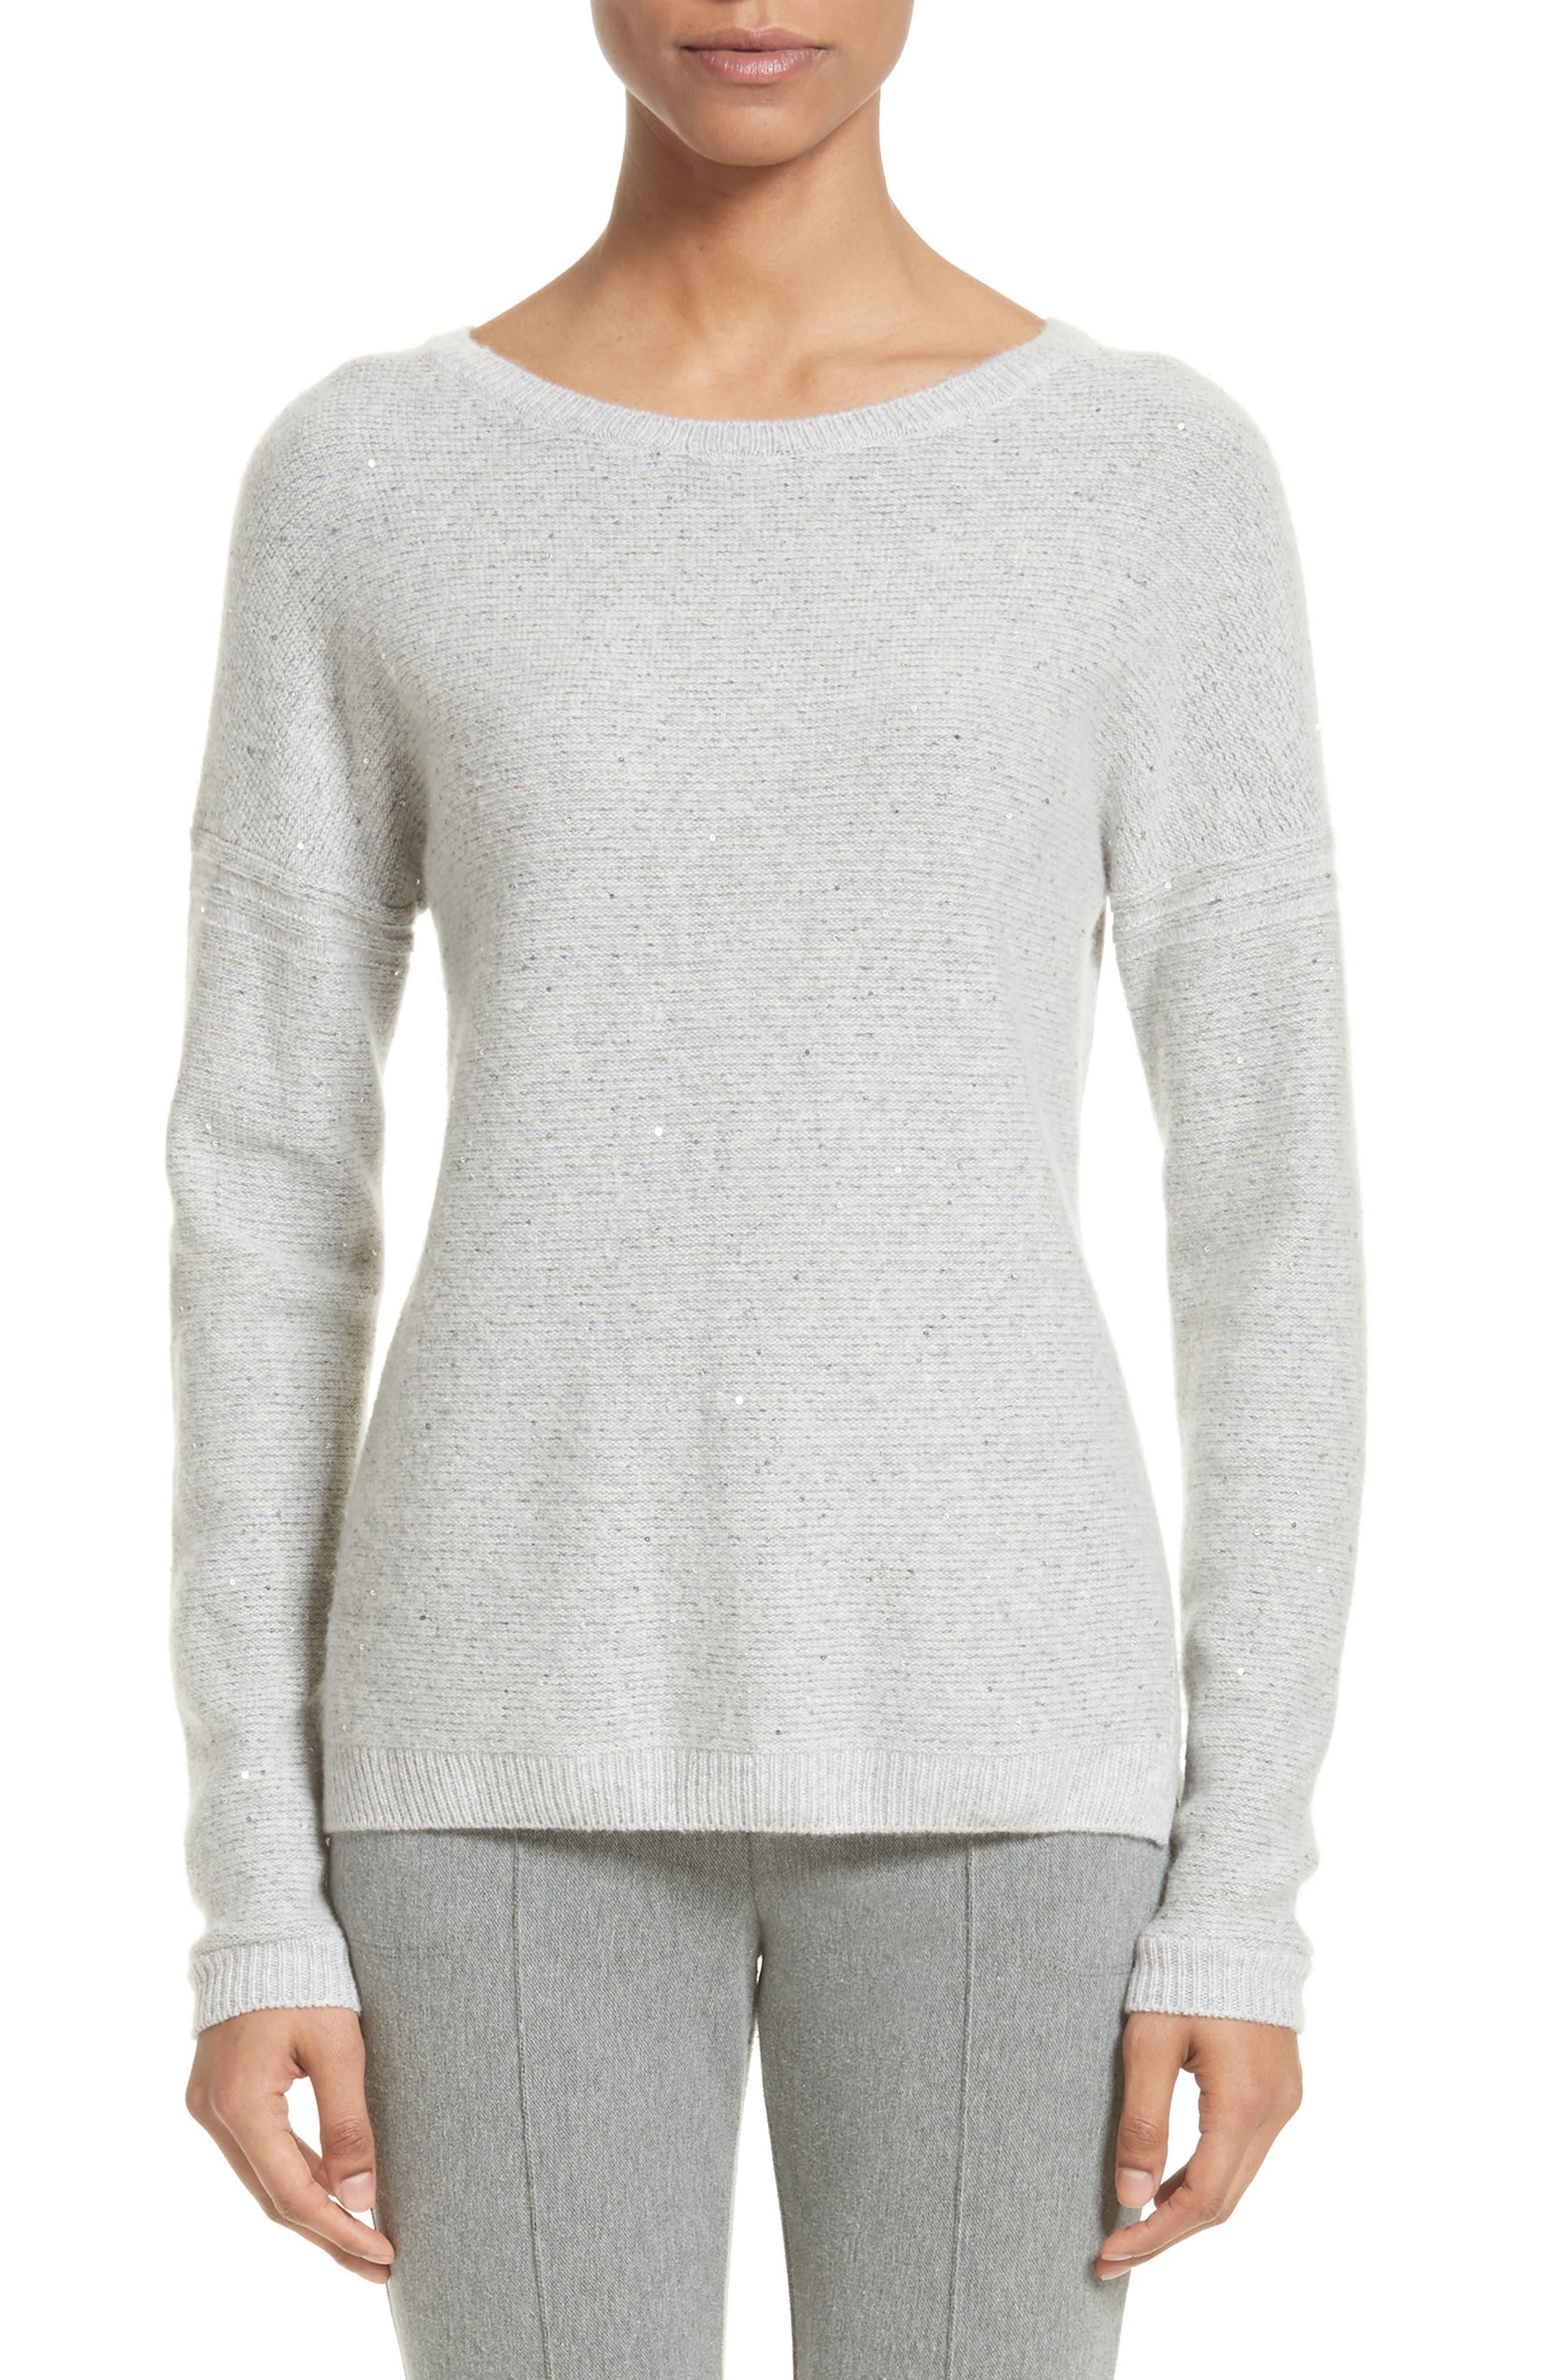 Micro Sequin Stripe Reverse Jersey Cashmere Blend Sweater,                         Main,                         color, Light Grey Melange